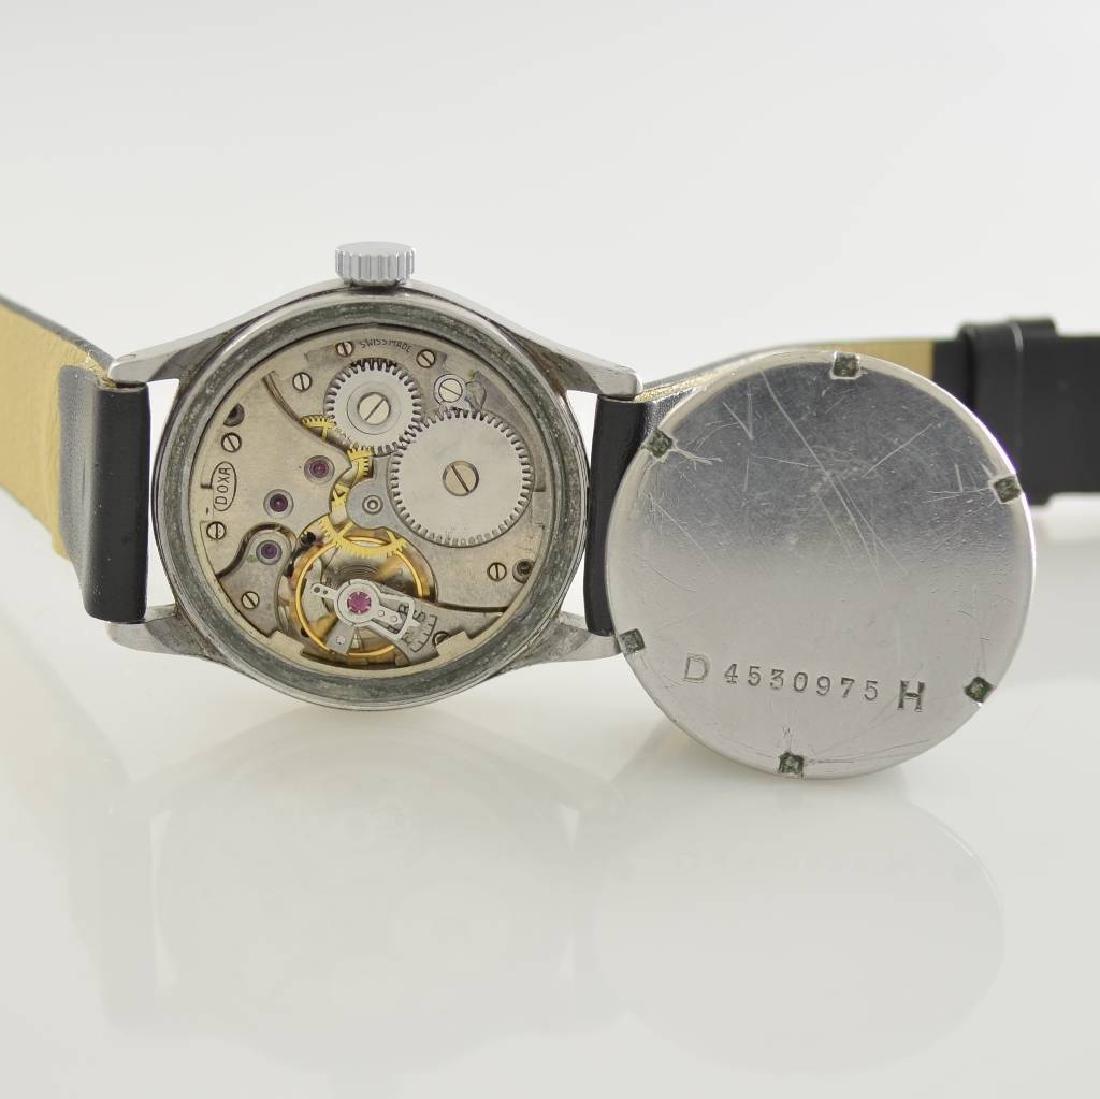 DOXA German military wrist watch D4530975H - 7